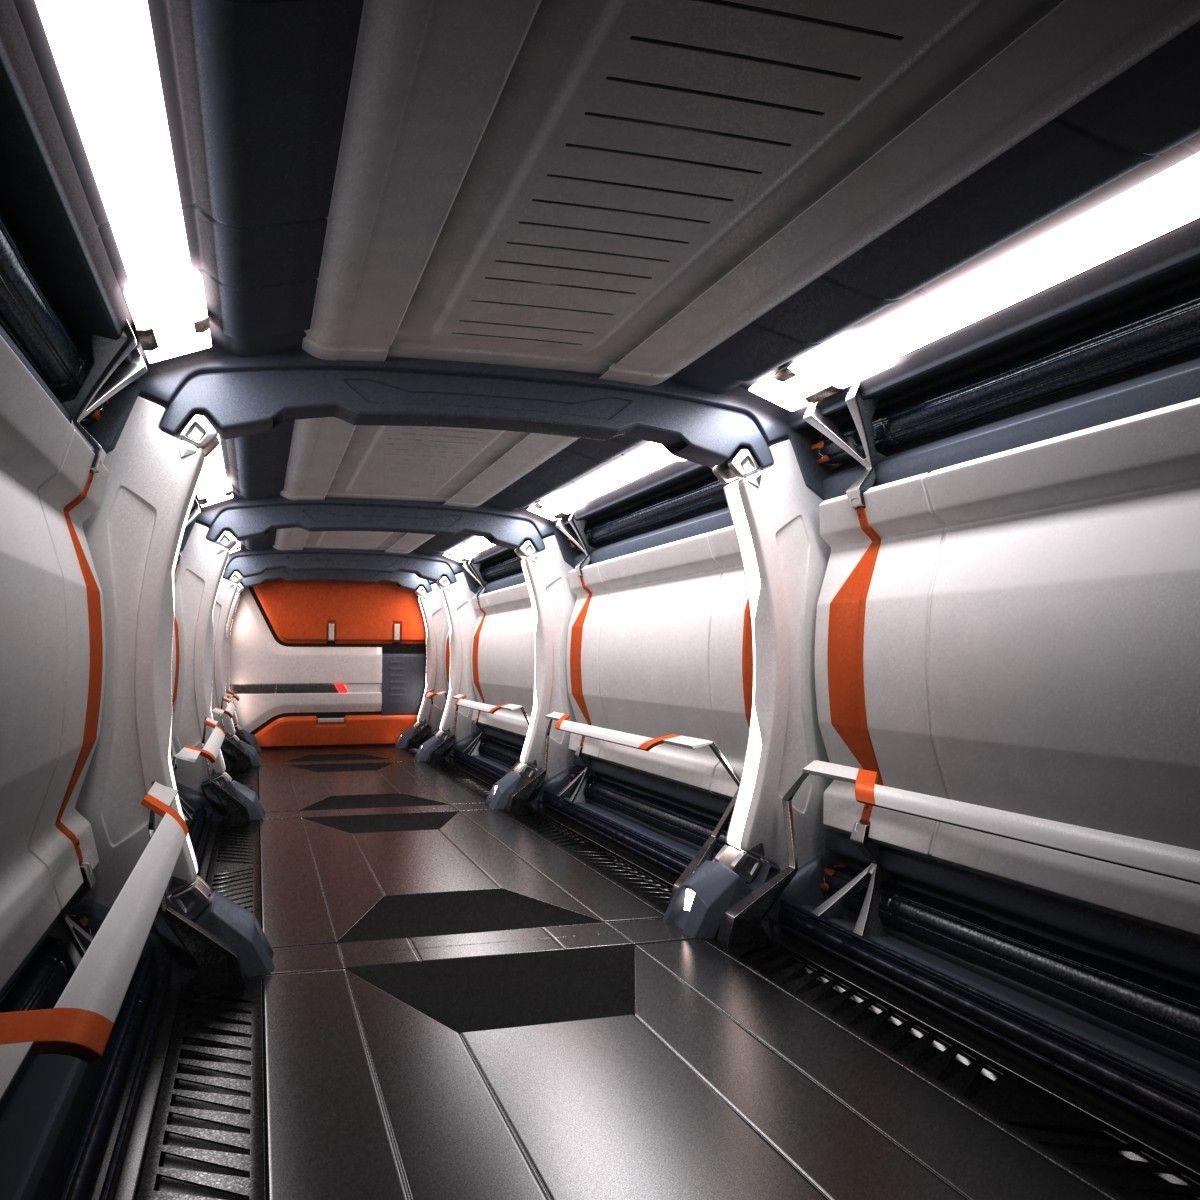 sci fi spaceship corridor 3d max futuristic interior en. Black Bedroom Furniture Sets. Home Design Ideas